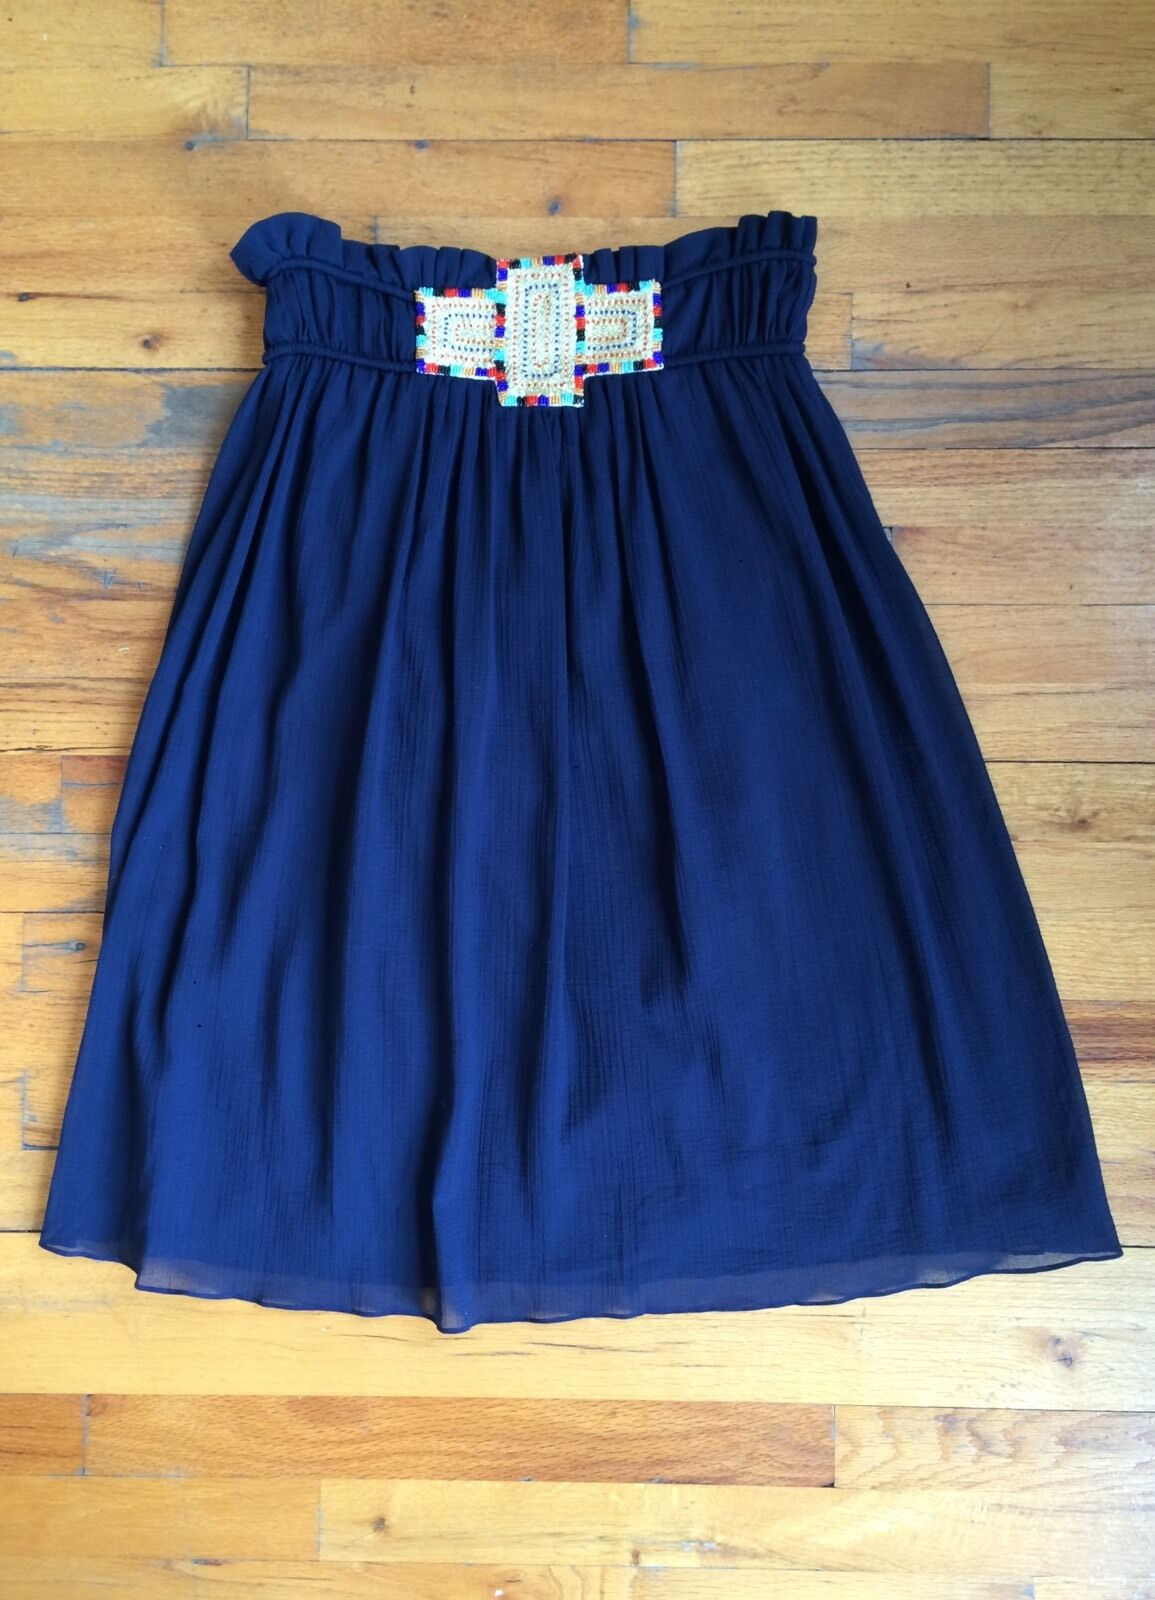 Foley & Corinna bluee Cotton Boho Peasant Midi Skirt Embroidered Sz Sm PERFECT